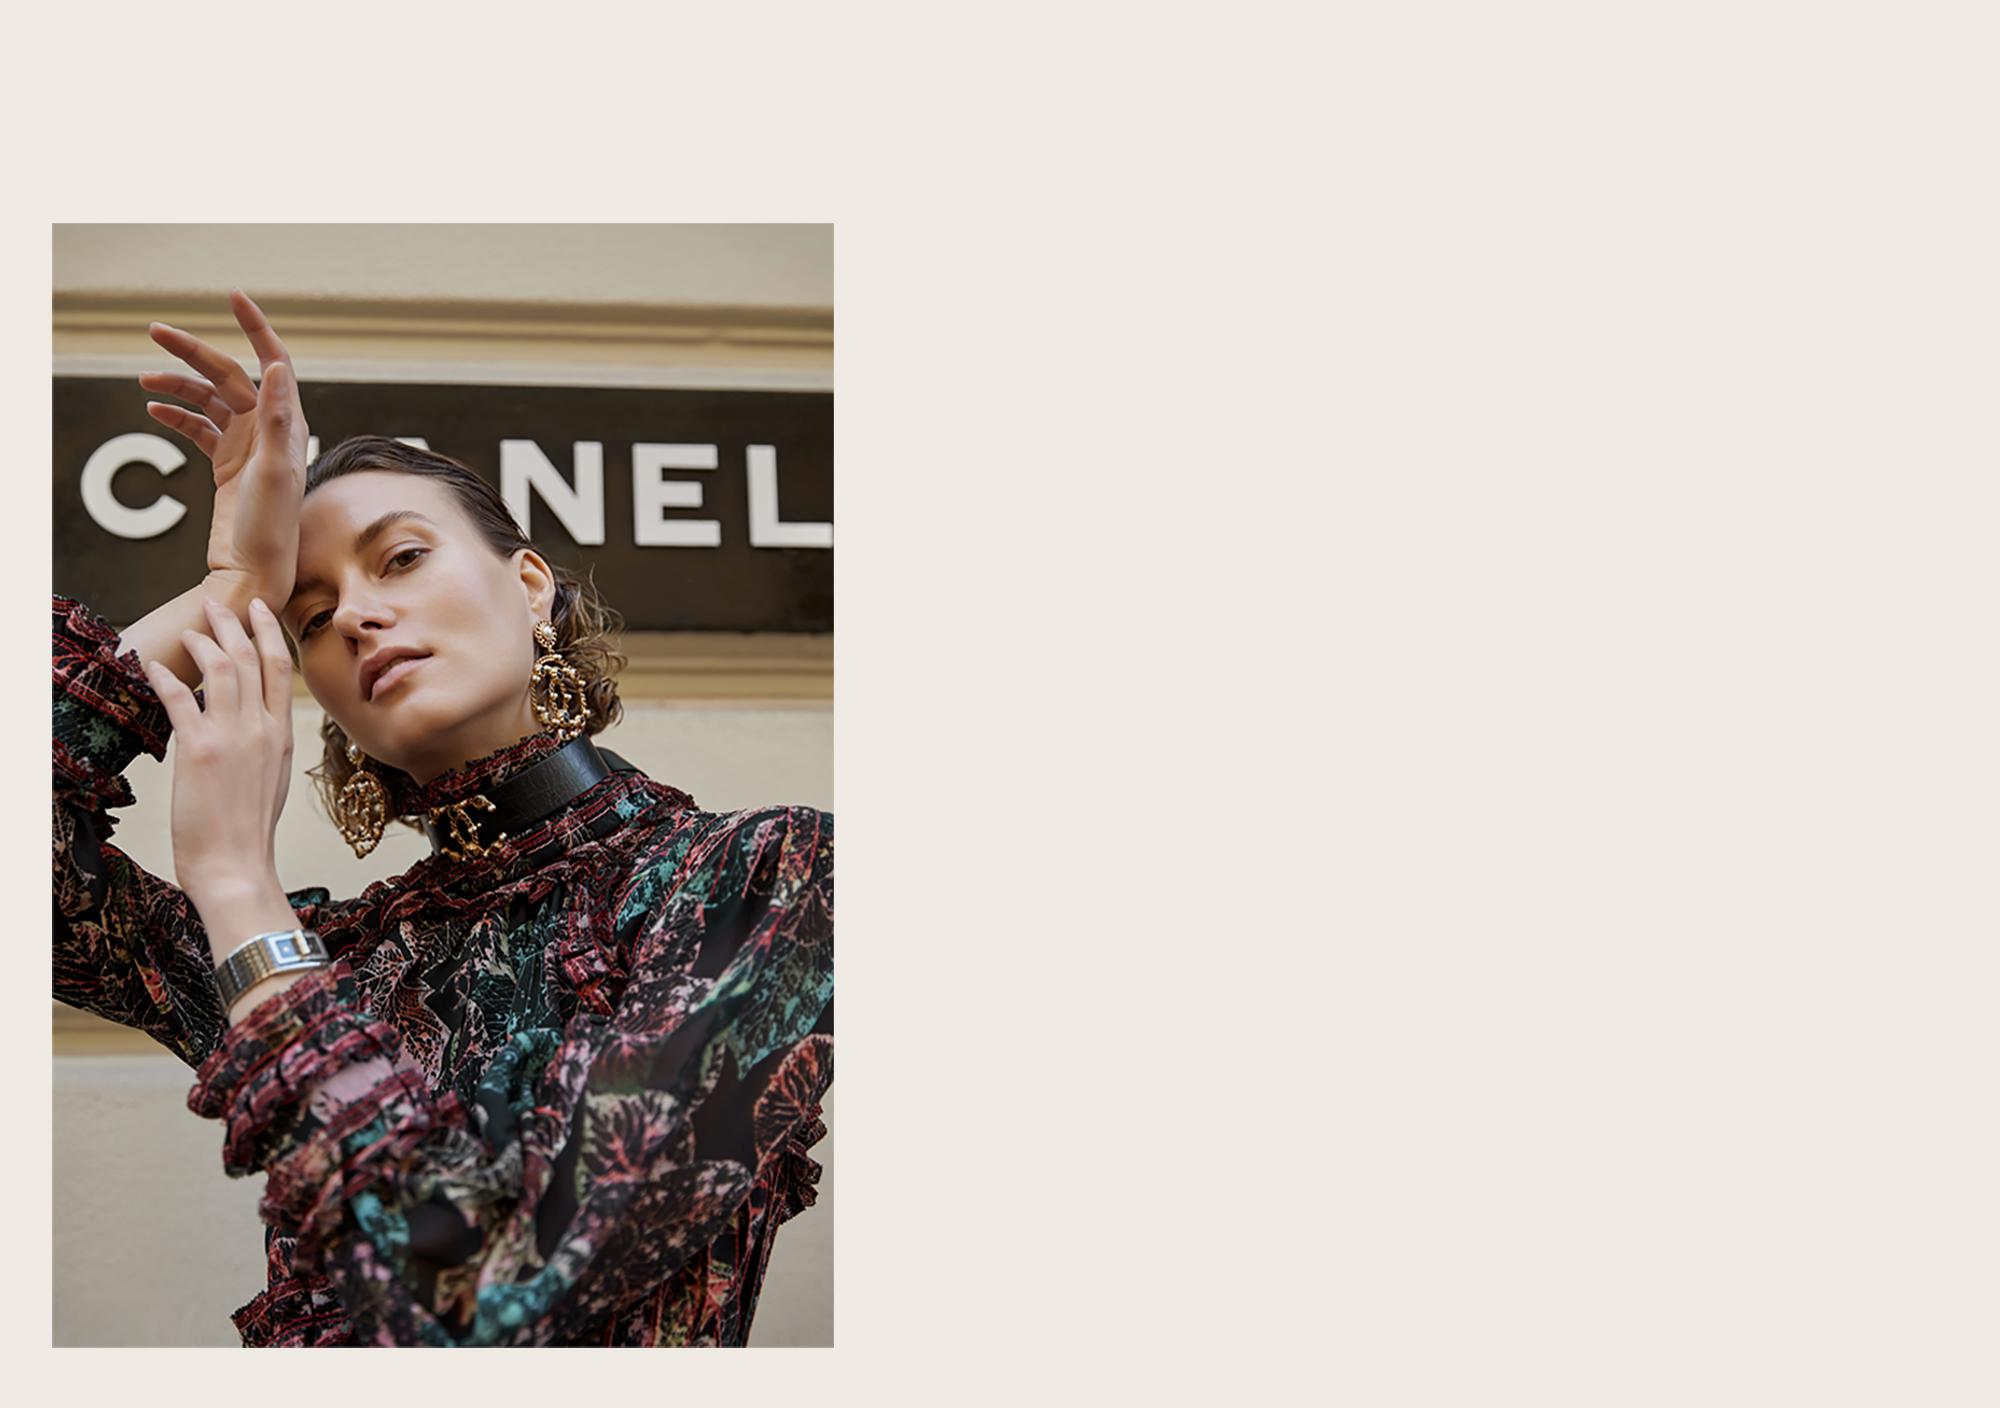 Coco, Code, Watch, Chanel, Photography, Editorial, Paris, Fashion, Week, Oracle Fox, Amanda, Shadforth